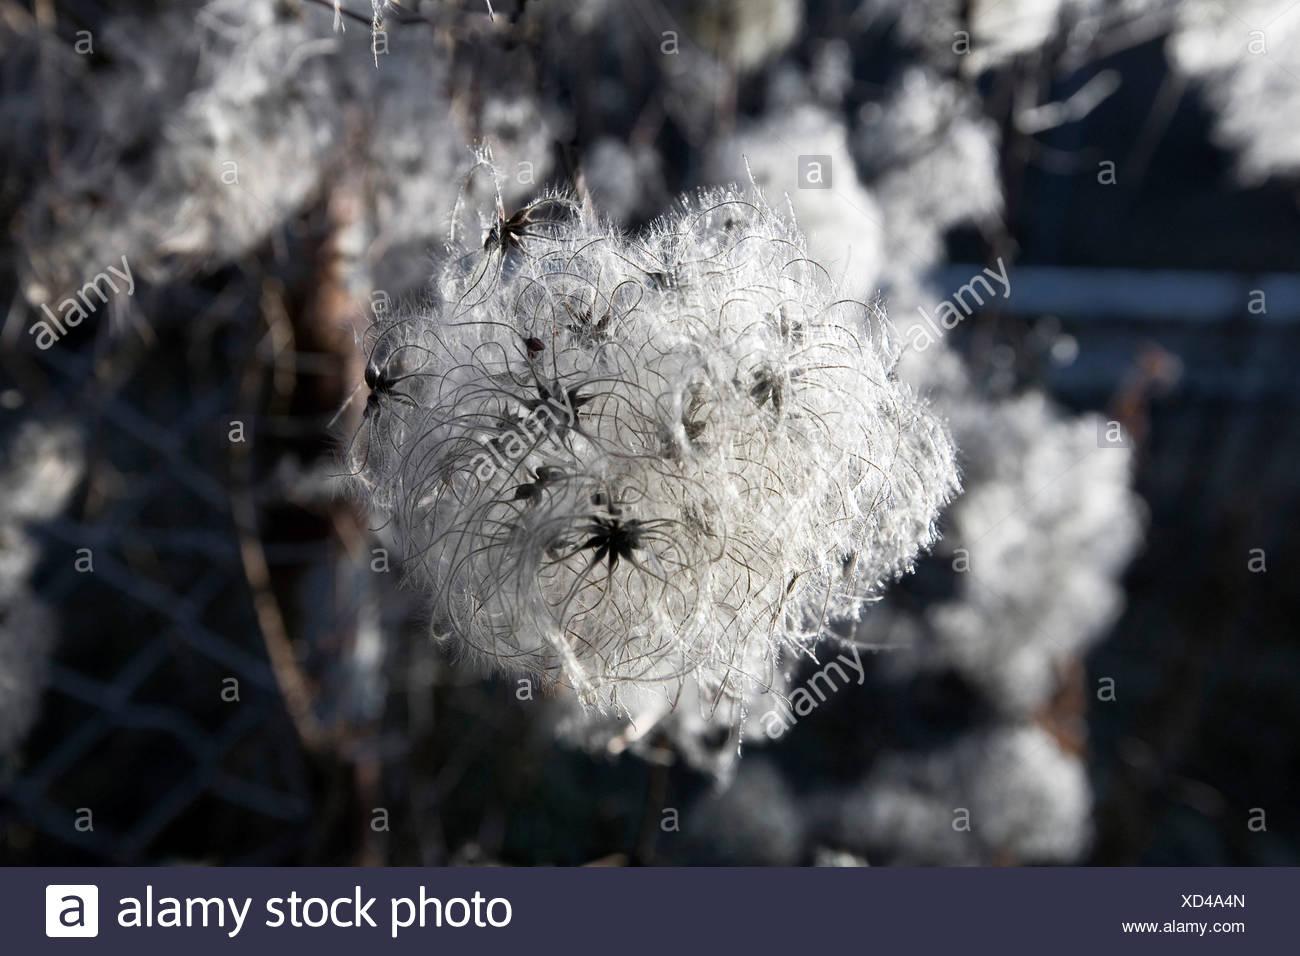 Old Man's Beard or Traveller's Joy (Clematis vitalba) in wintertime - Stock Image